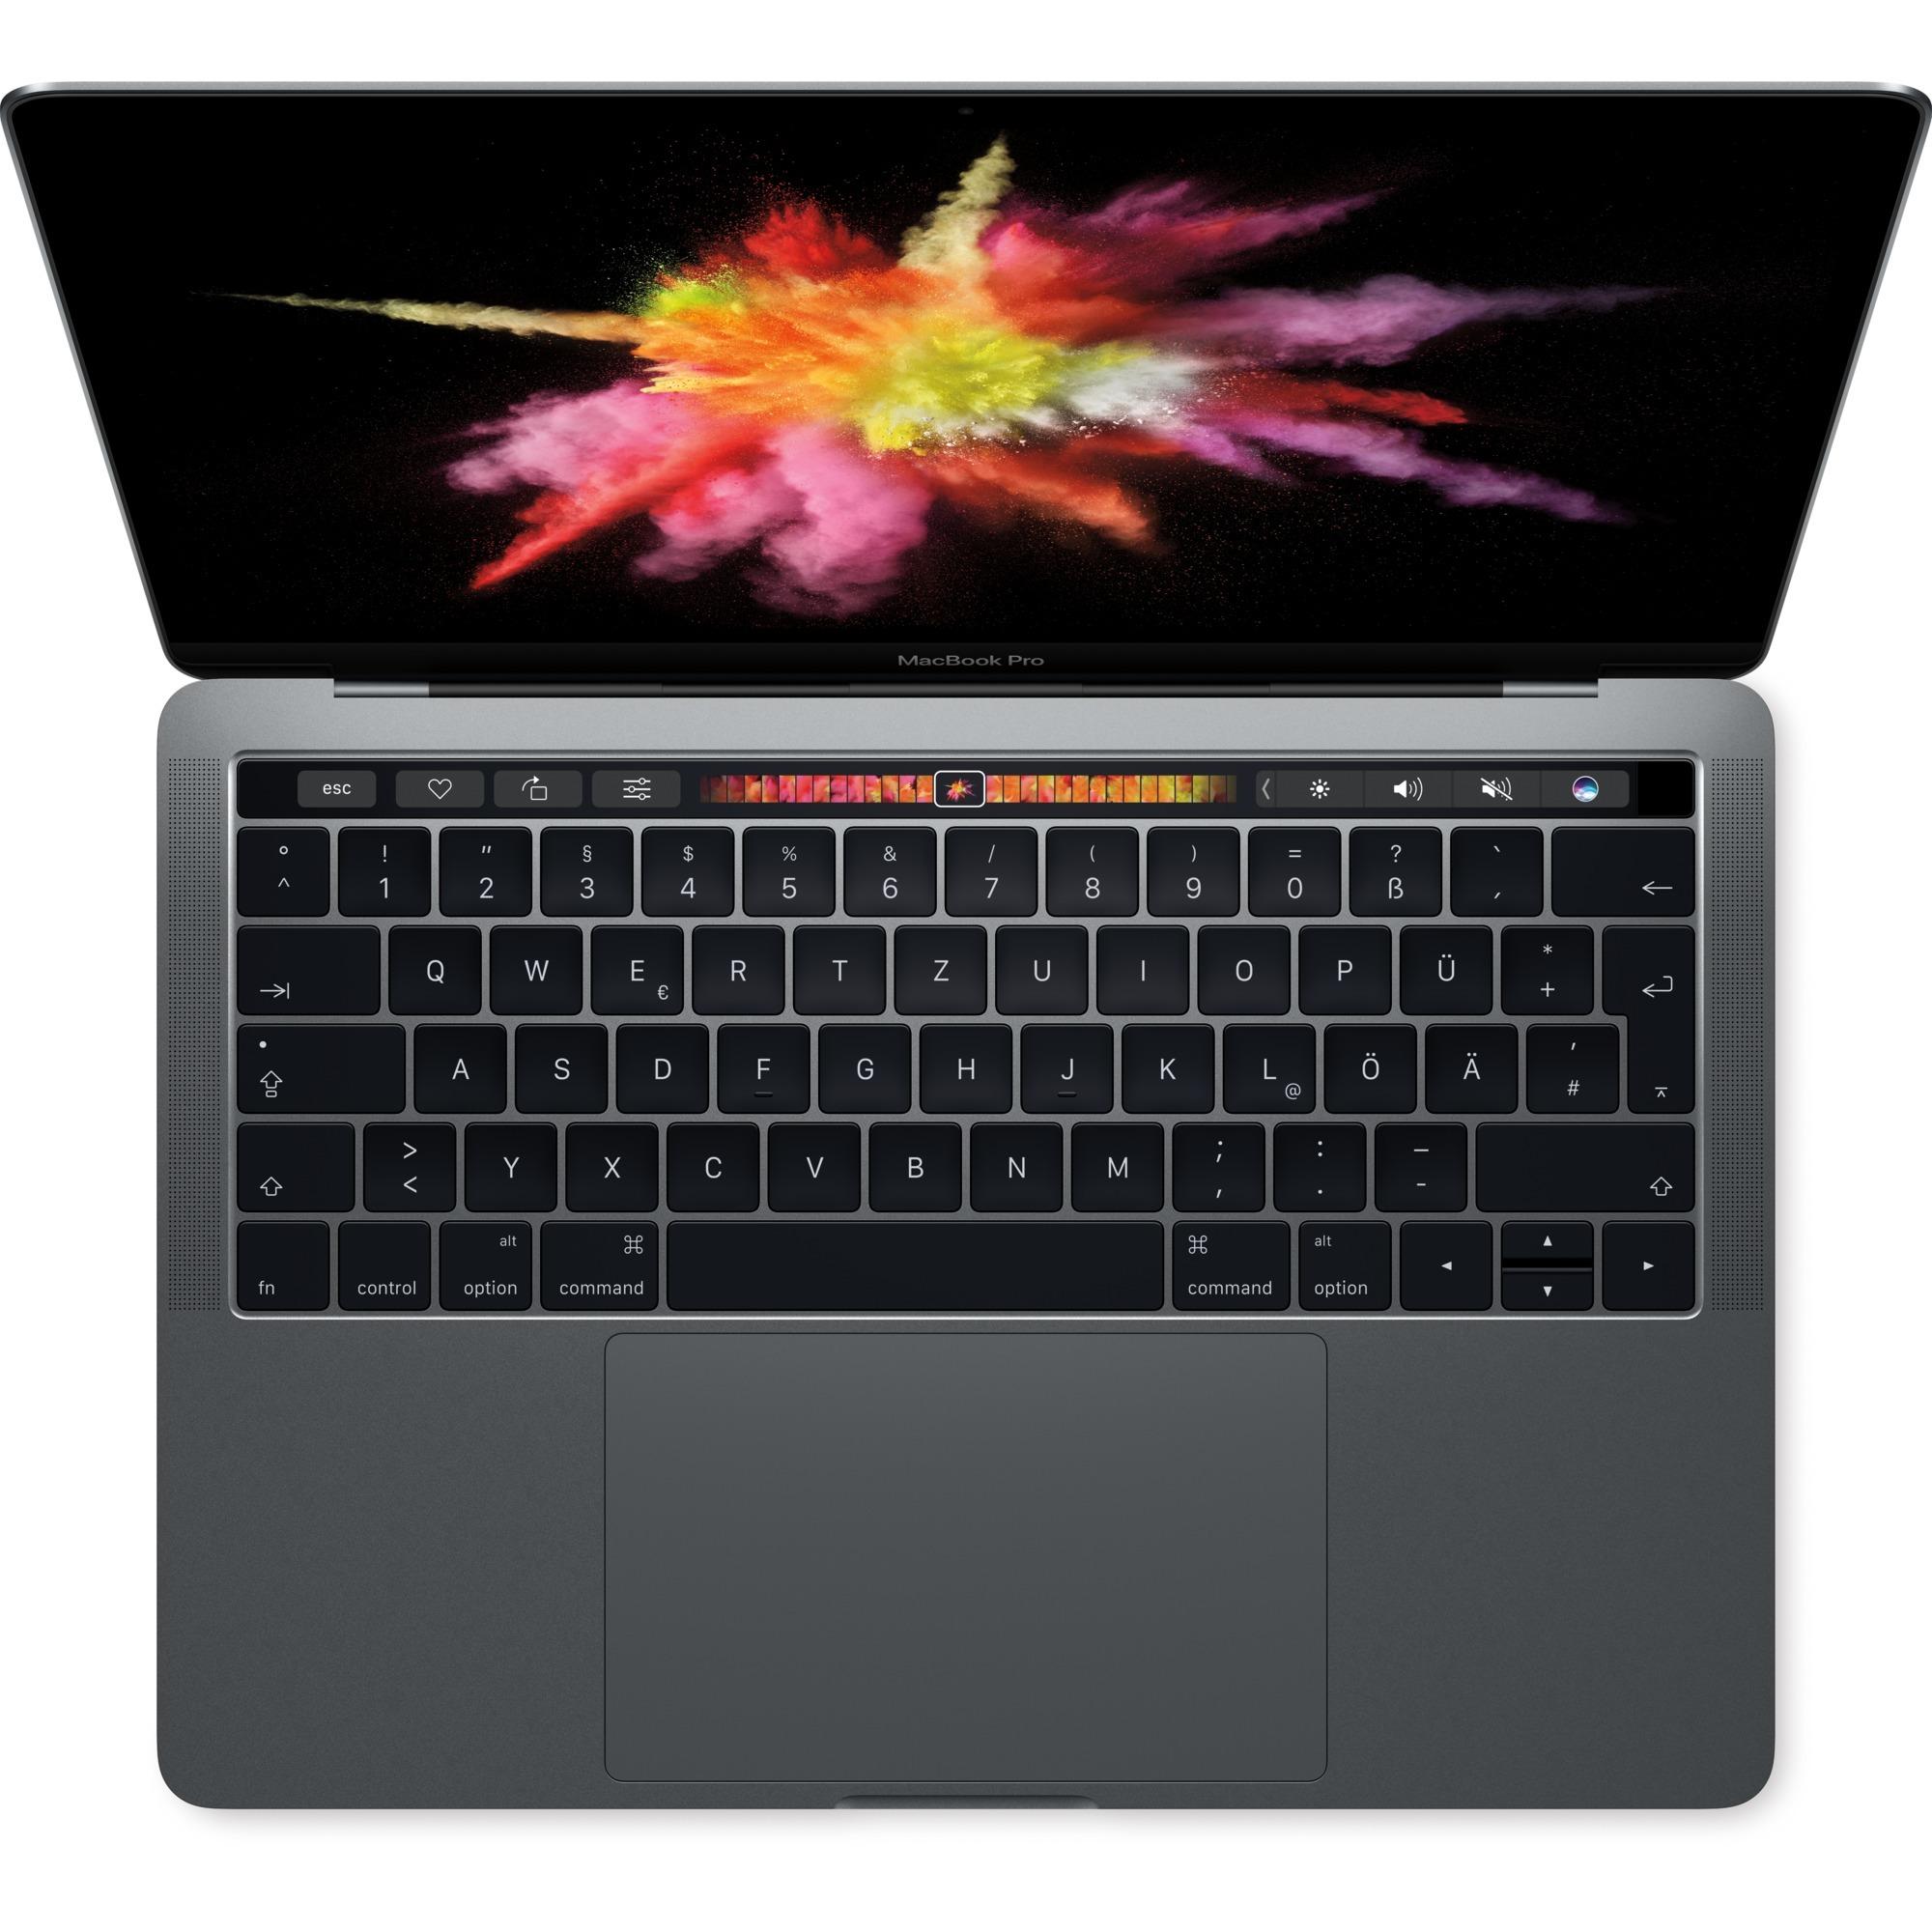 MacBook Pro 3.1GHz i5-7267U 13.3